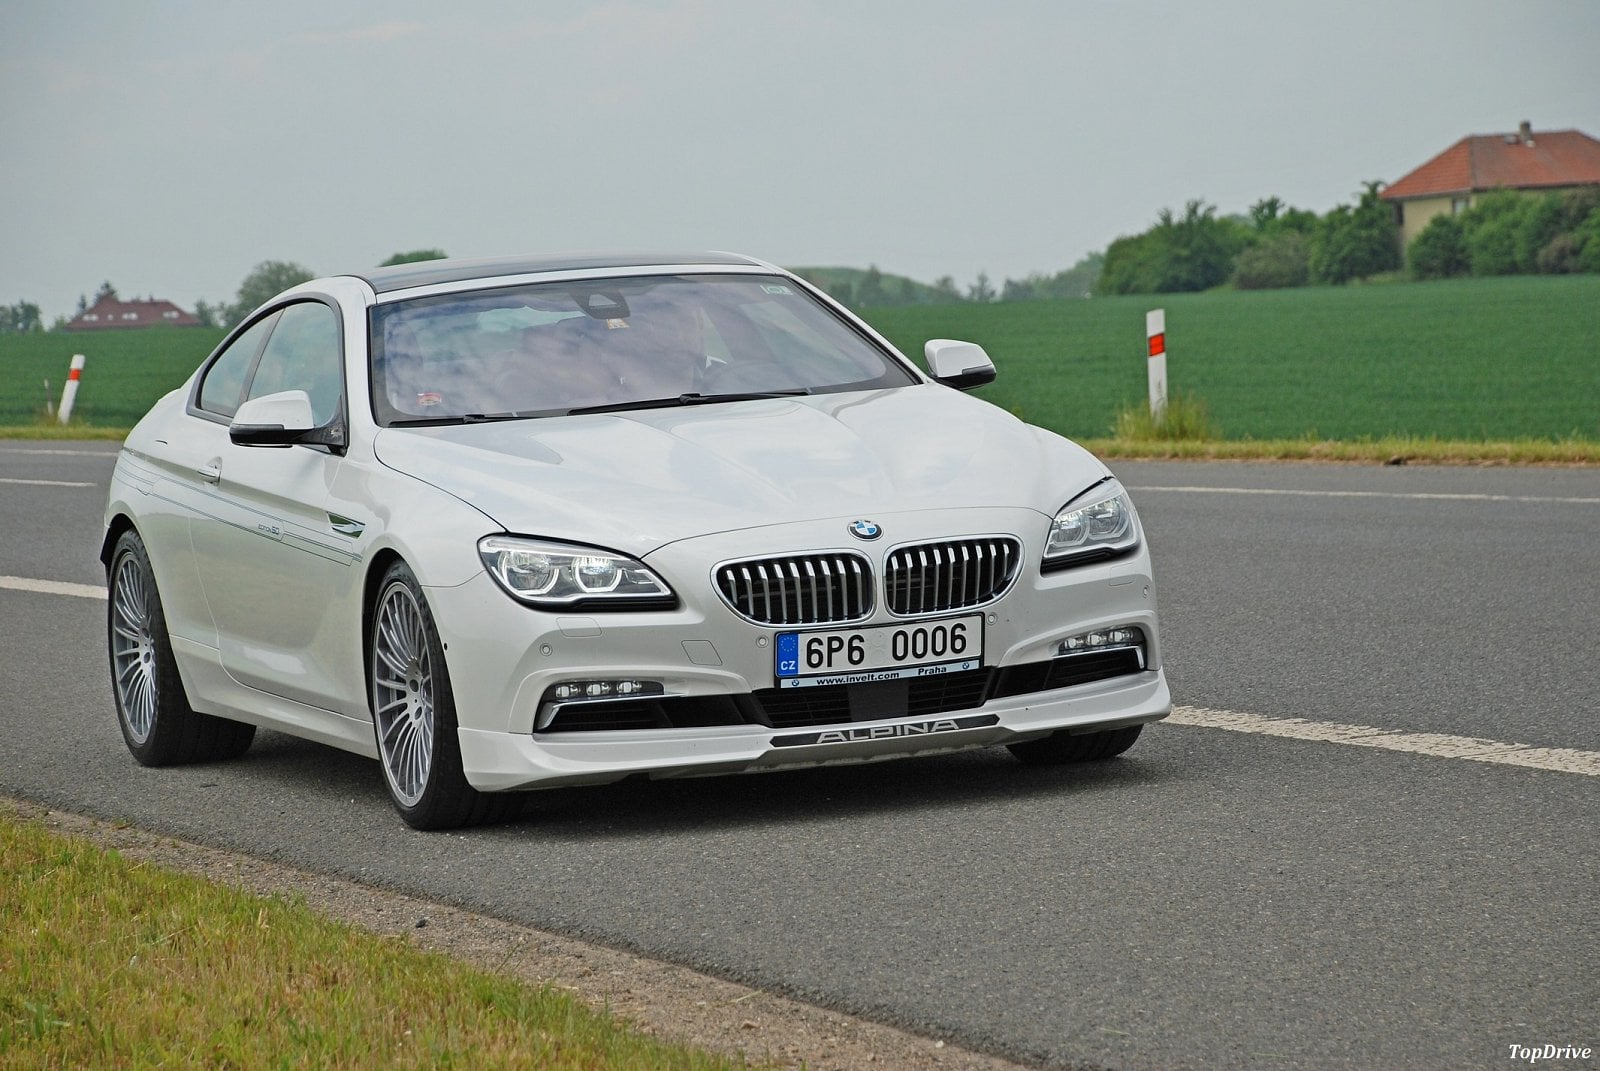 Fotogalerie: BMW Alpina B6 Biturbo Coupé Edition 50 (TEST)